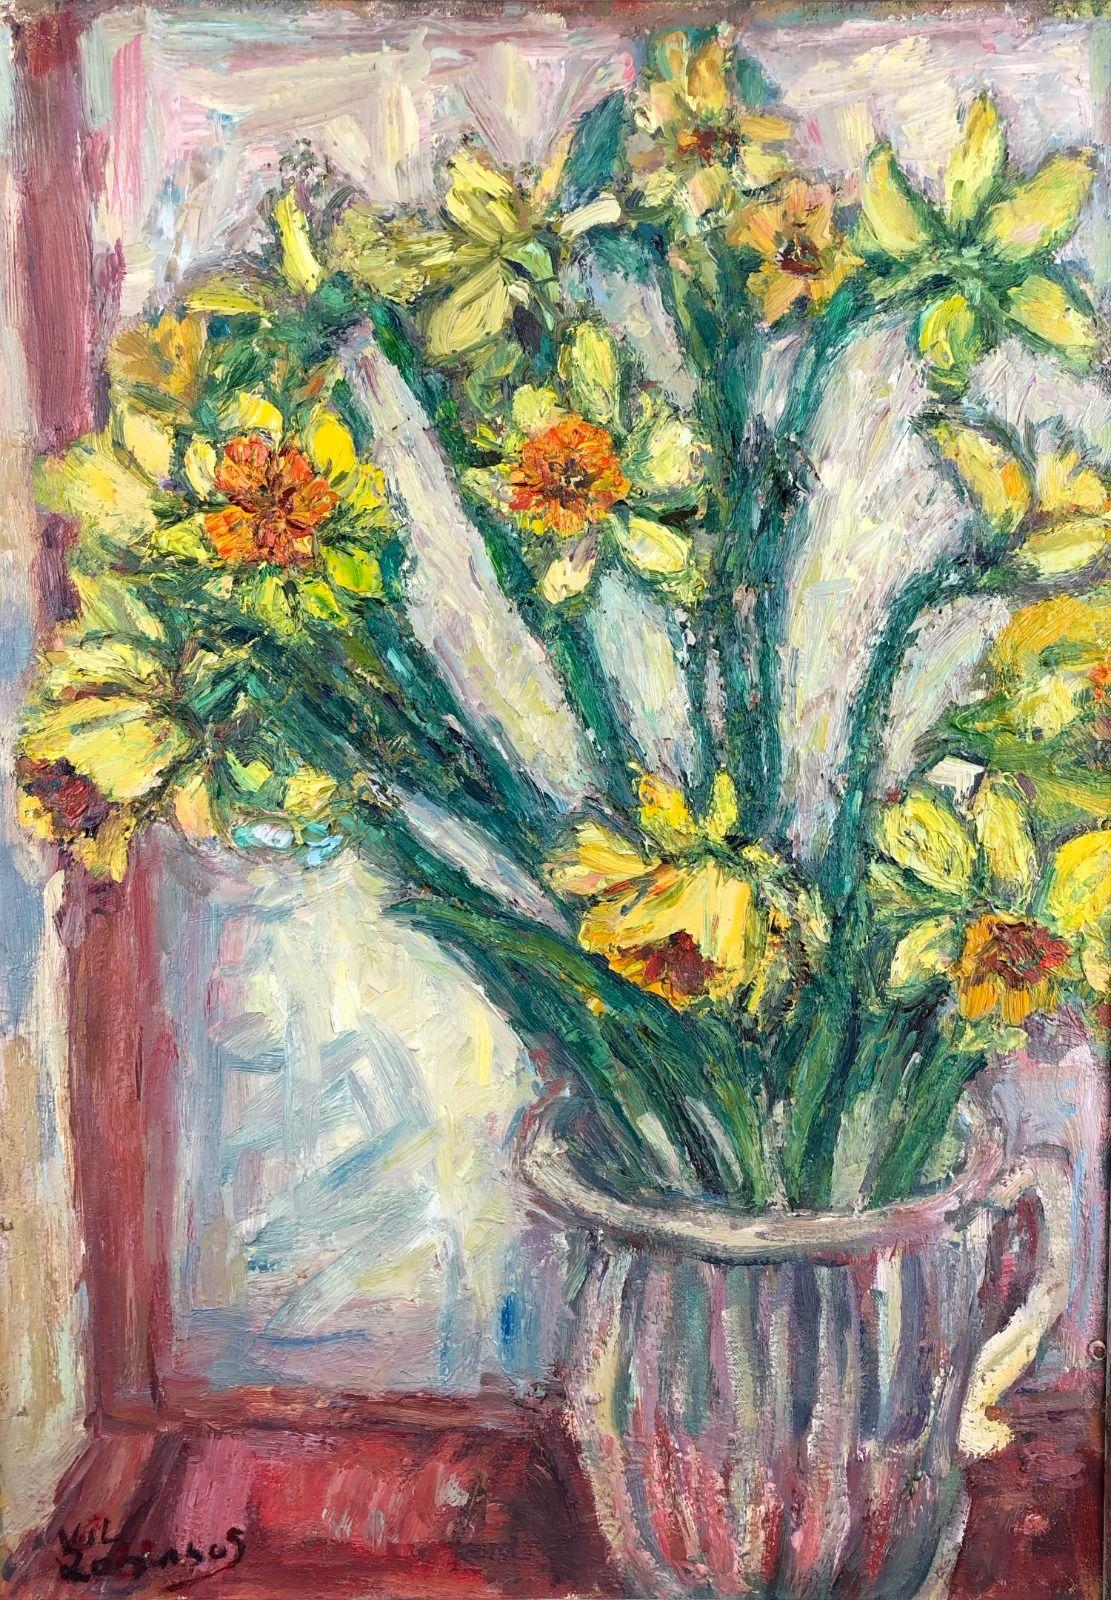 Daffodils in a Jug 1. 36in x 24in